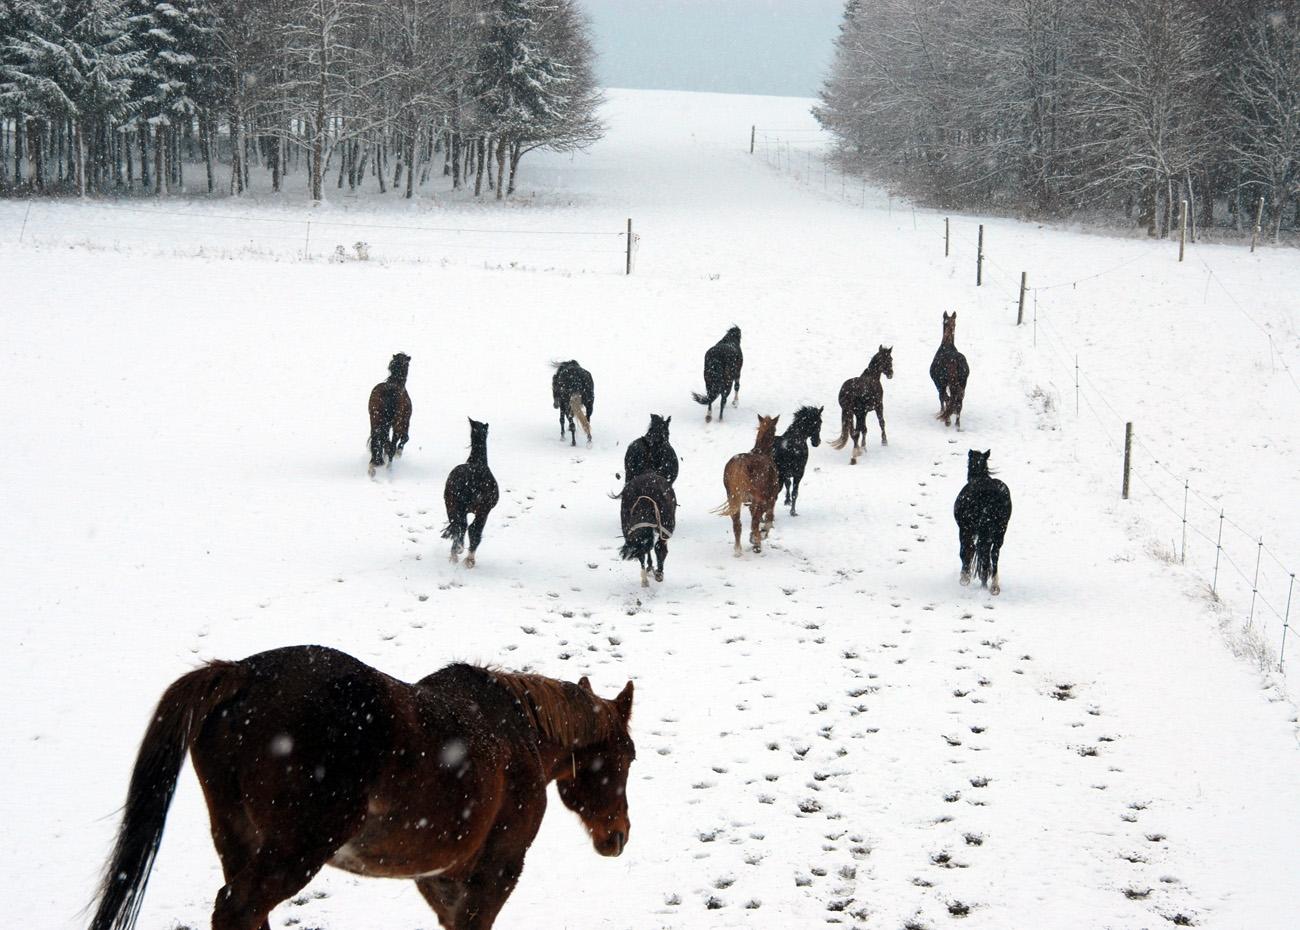 1. Home_Austrieb_Winter_1300x930_002